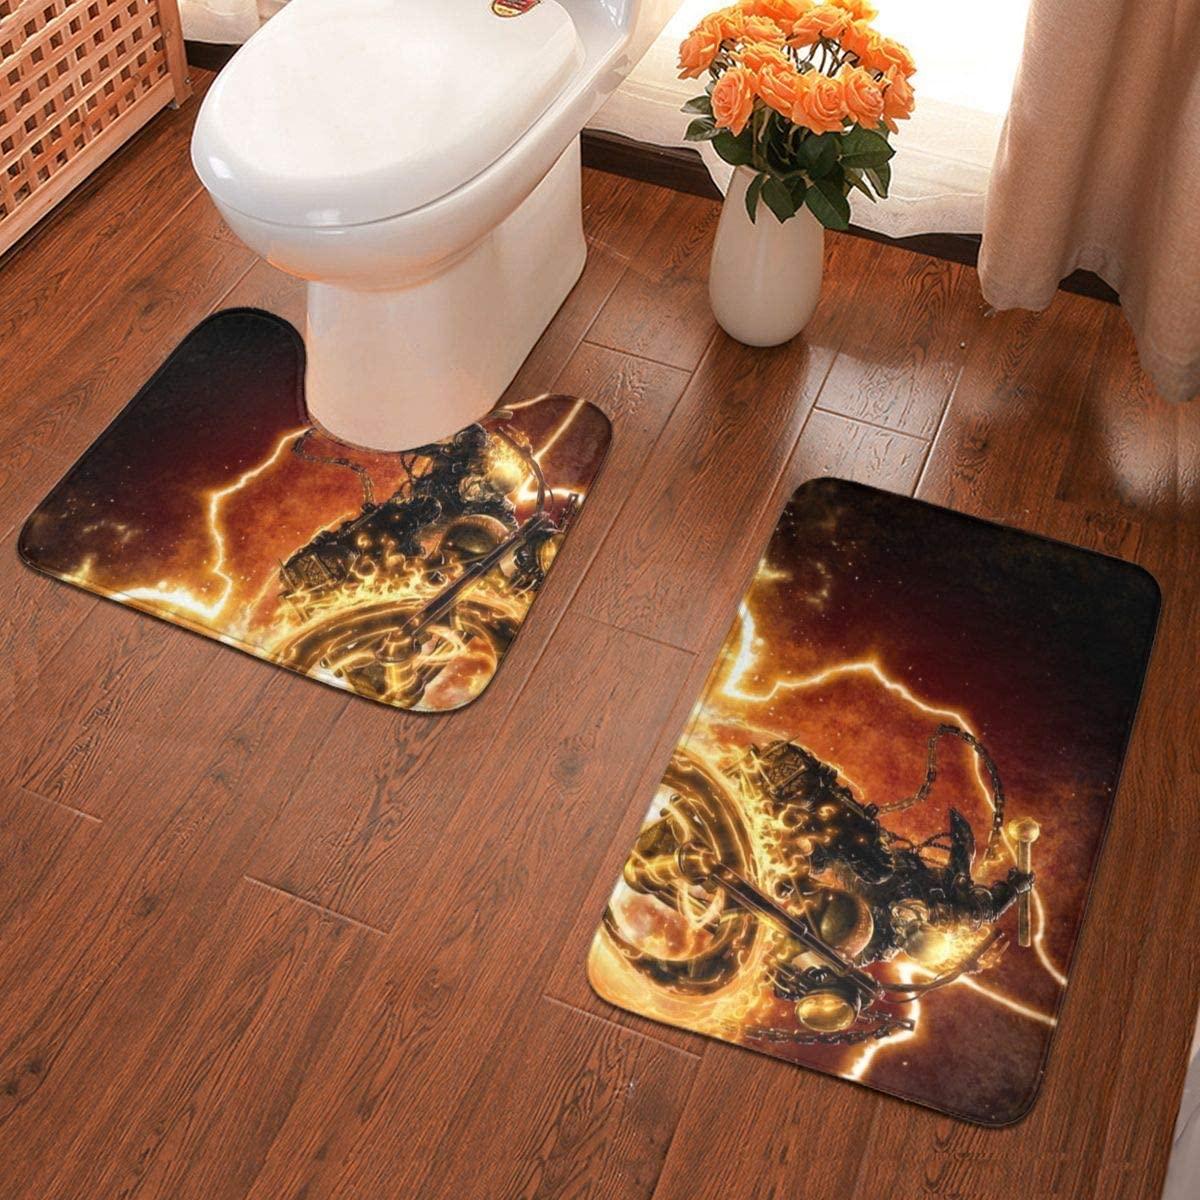 Boweike Ghost Rider Bathroom Antiskid Pad Non-Slip Bath Carpet Floor Mat Rug 2 Sets -Floor Mat+U-Shaped Pad, Toilet Washable Blanket Mats for Bathroom Home Shower